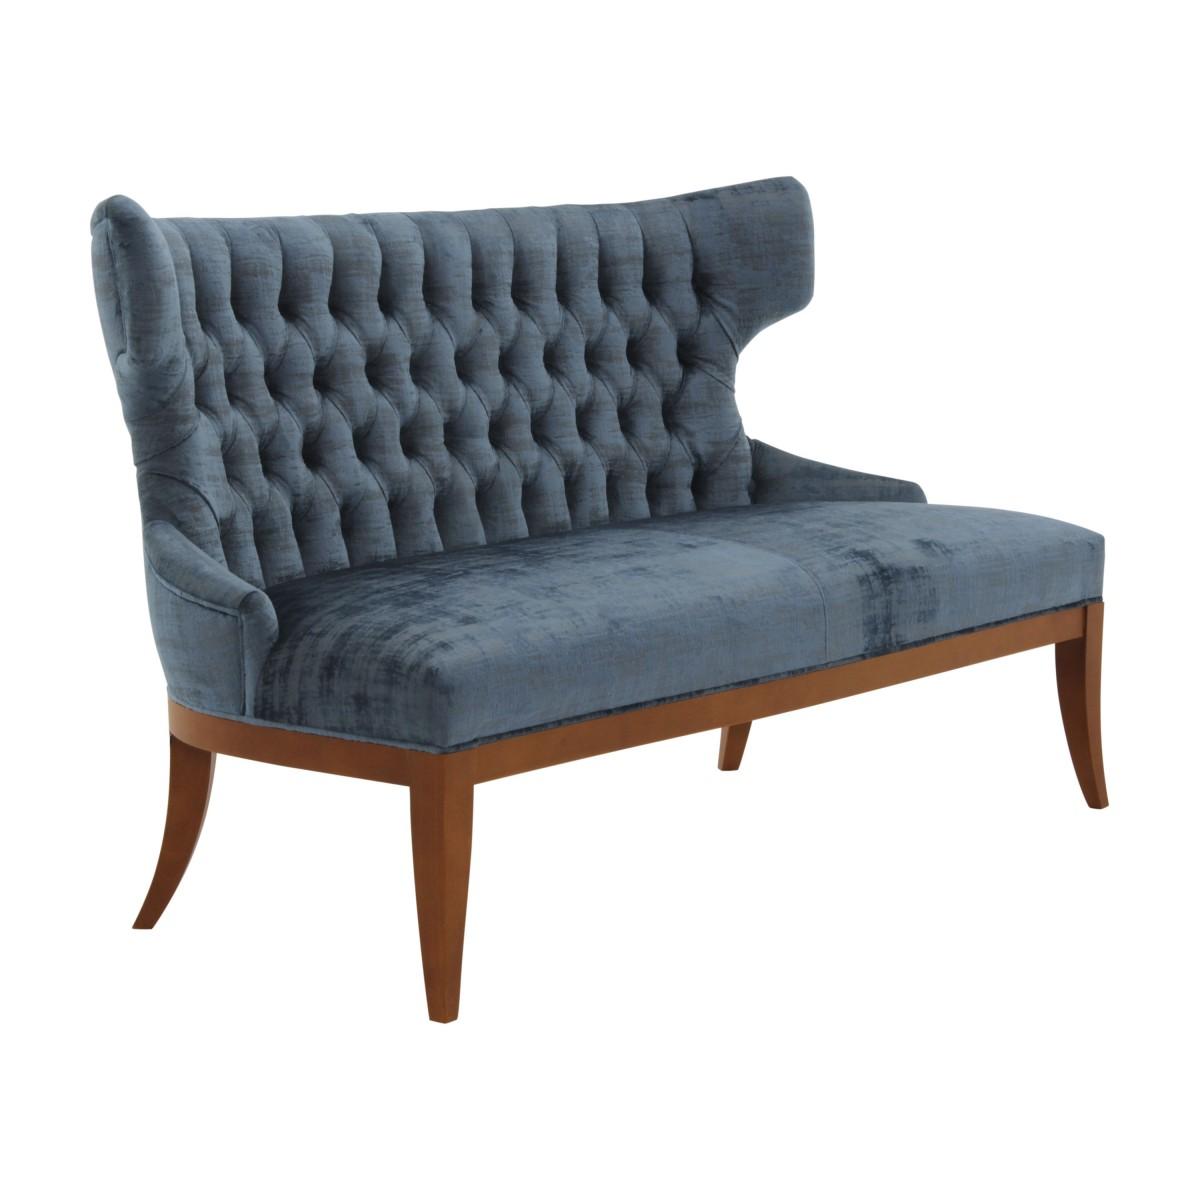 2 Seater sofa Irene - Sevensedie